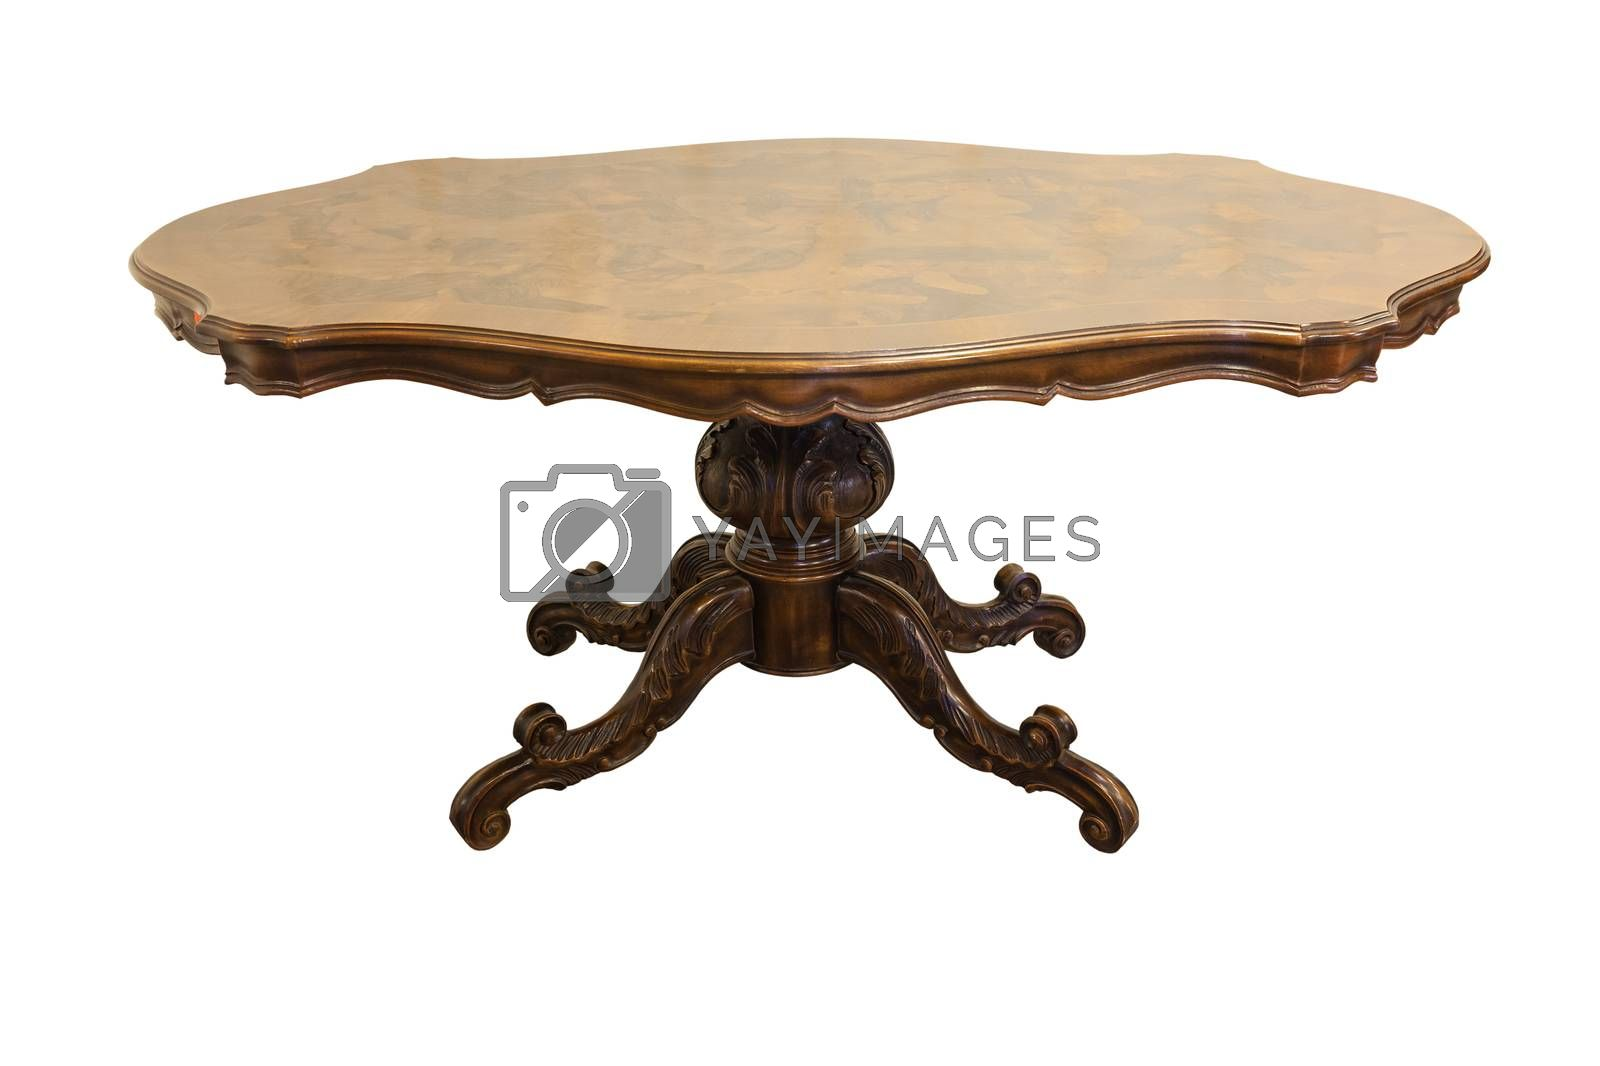 Antique twentieth century table isolated on white background